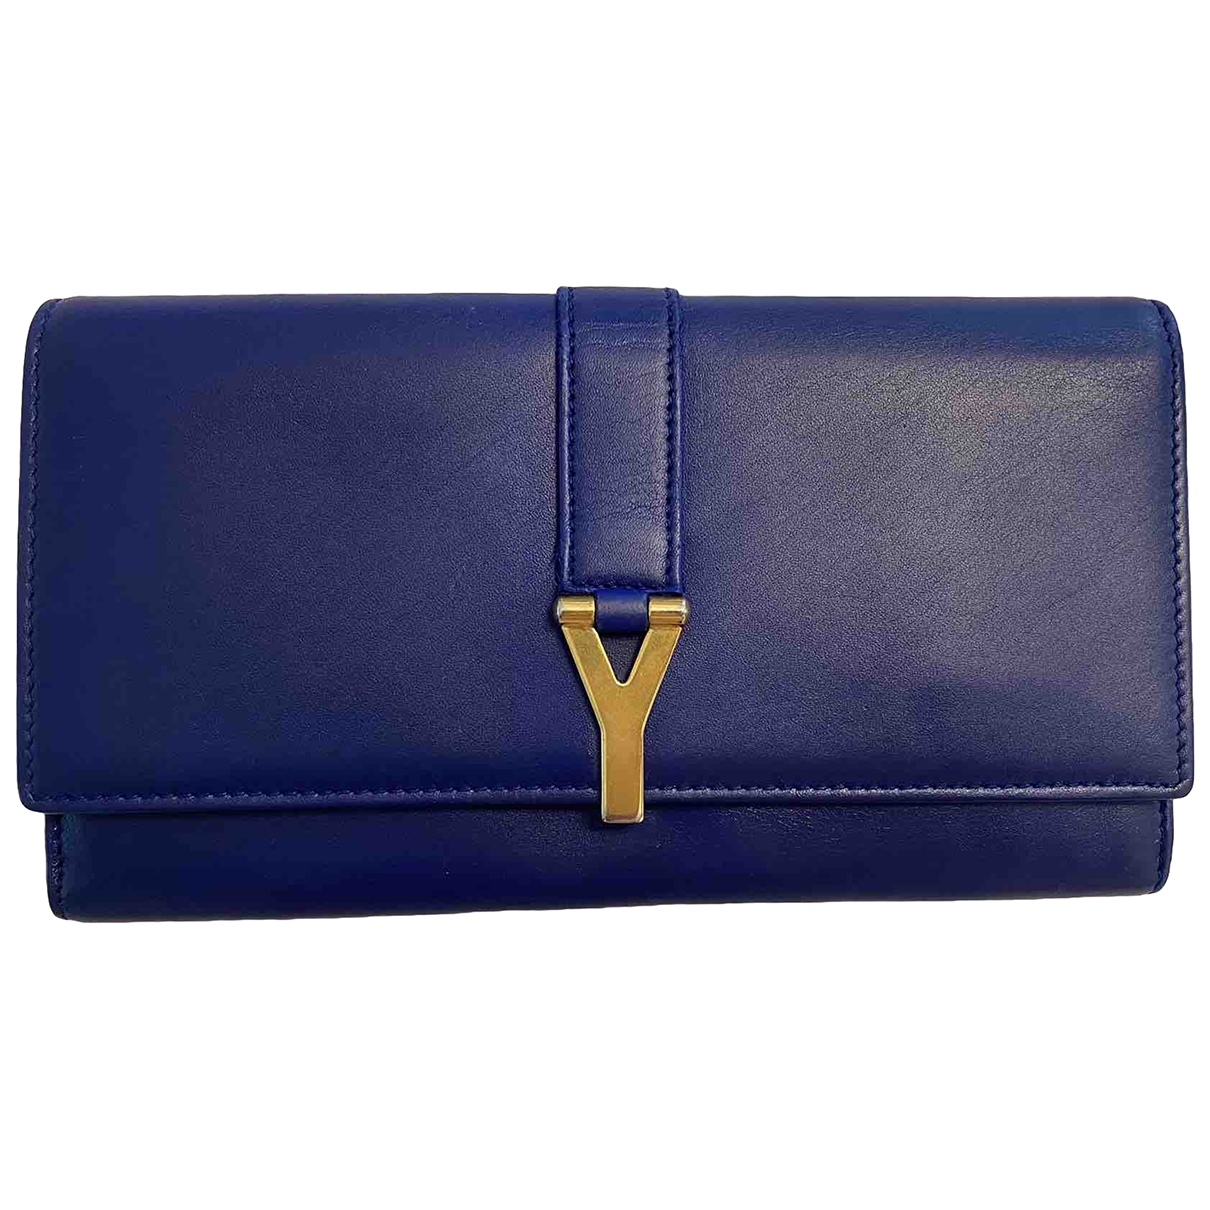 Saint Laurent Chyc Blue Leather wallet for Women \N